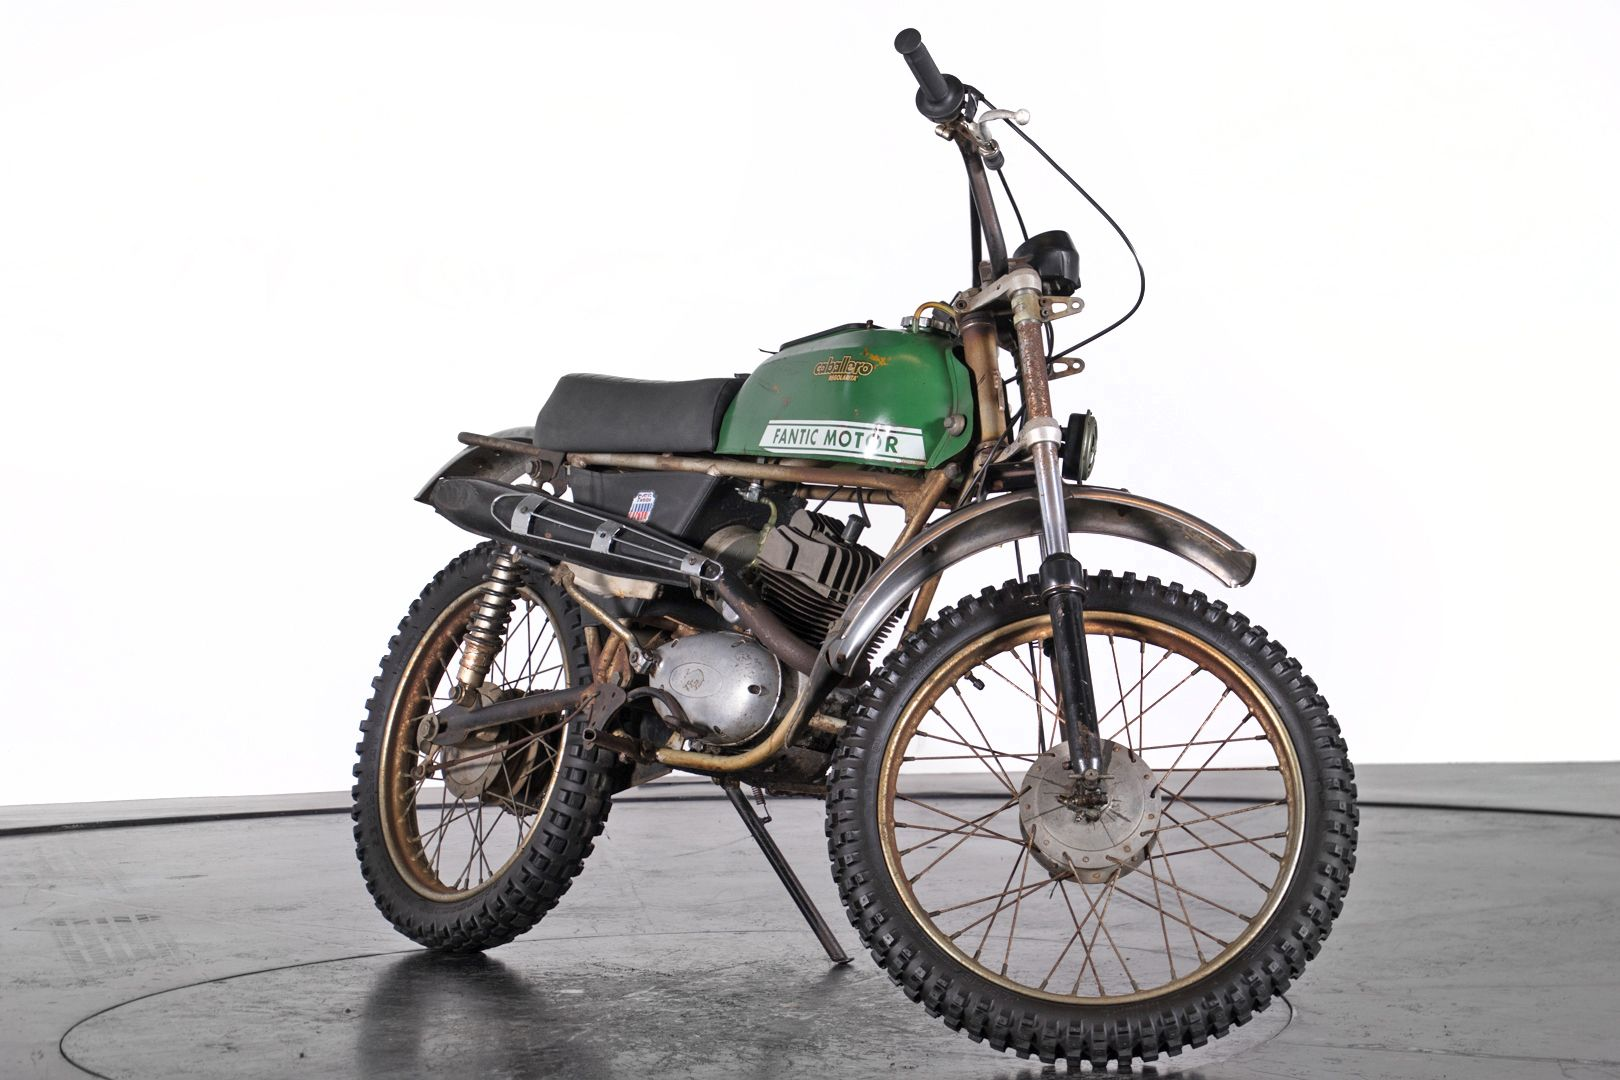 1971 FANTIC MOTOR CABALLERO 100 CROSS TX92 53131